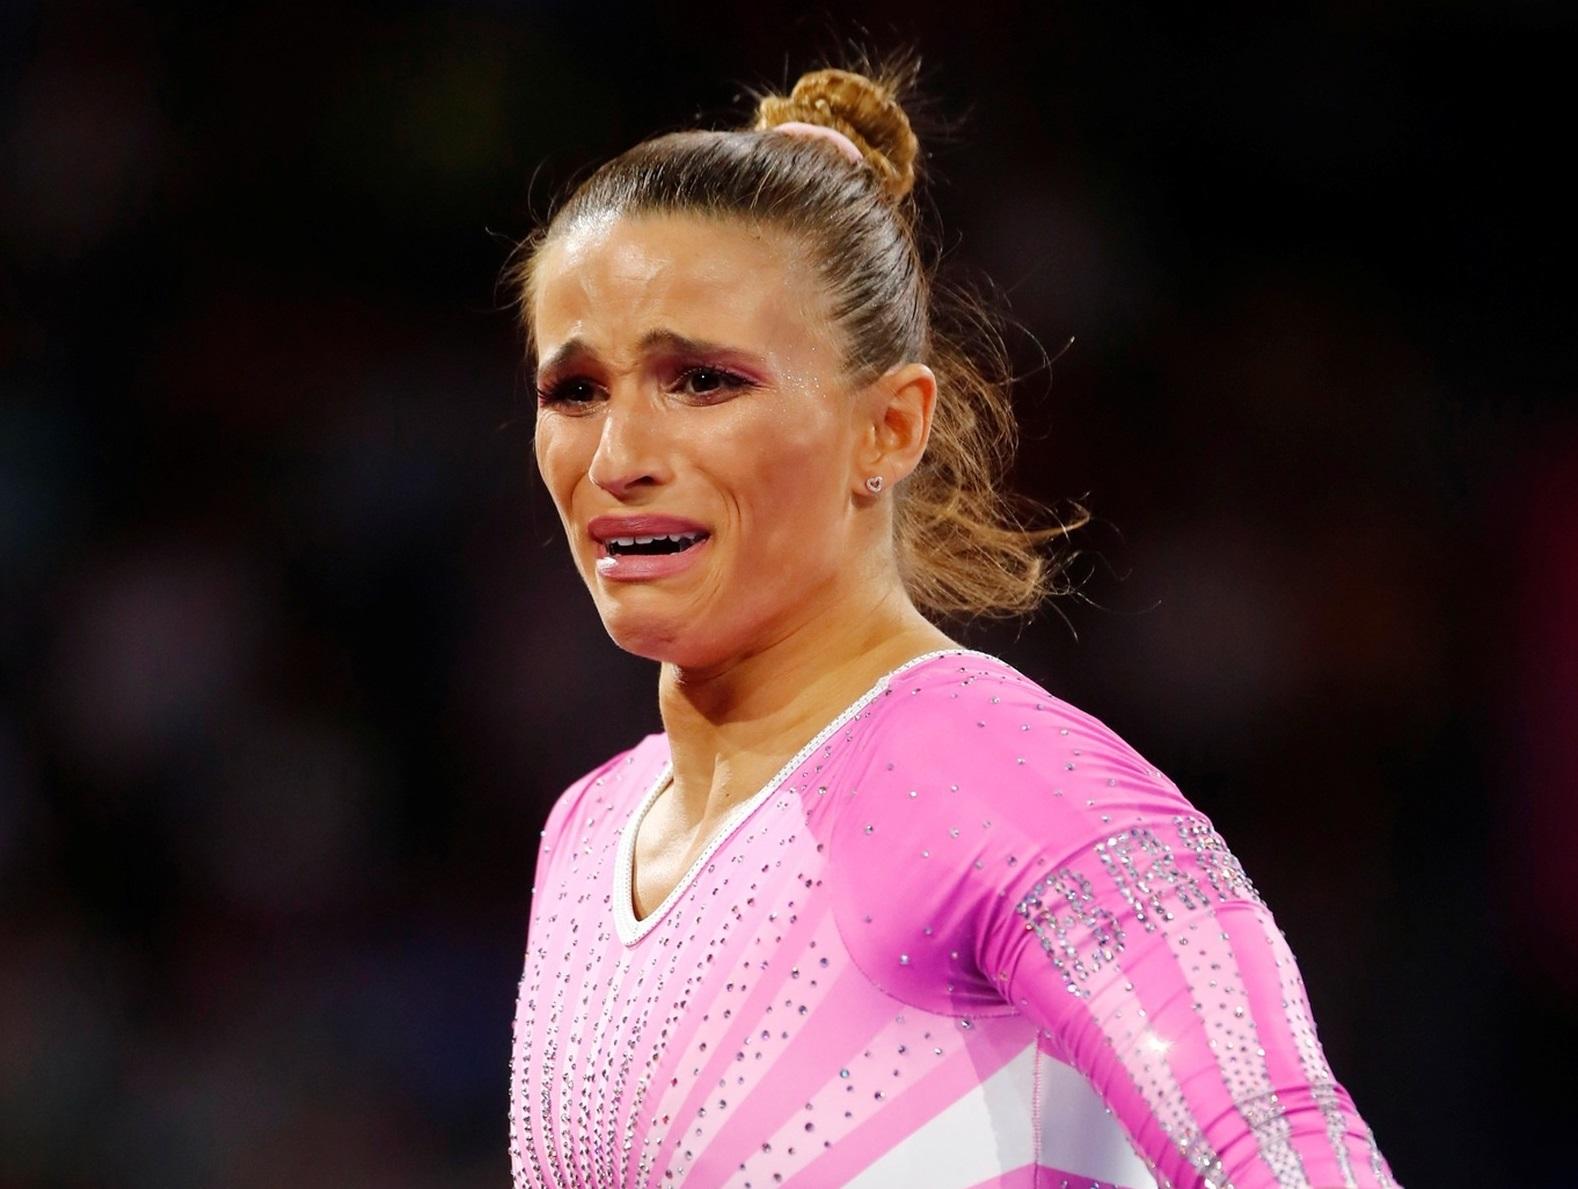 Jade se machuca, Brasil falha e fica sem vaga olímpica